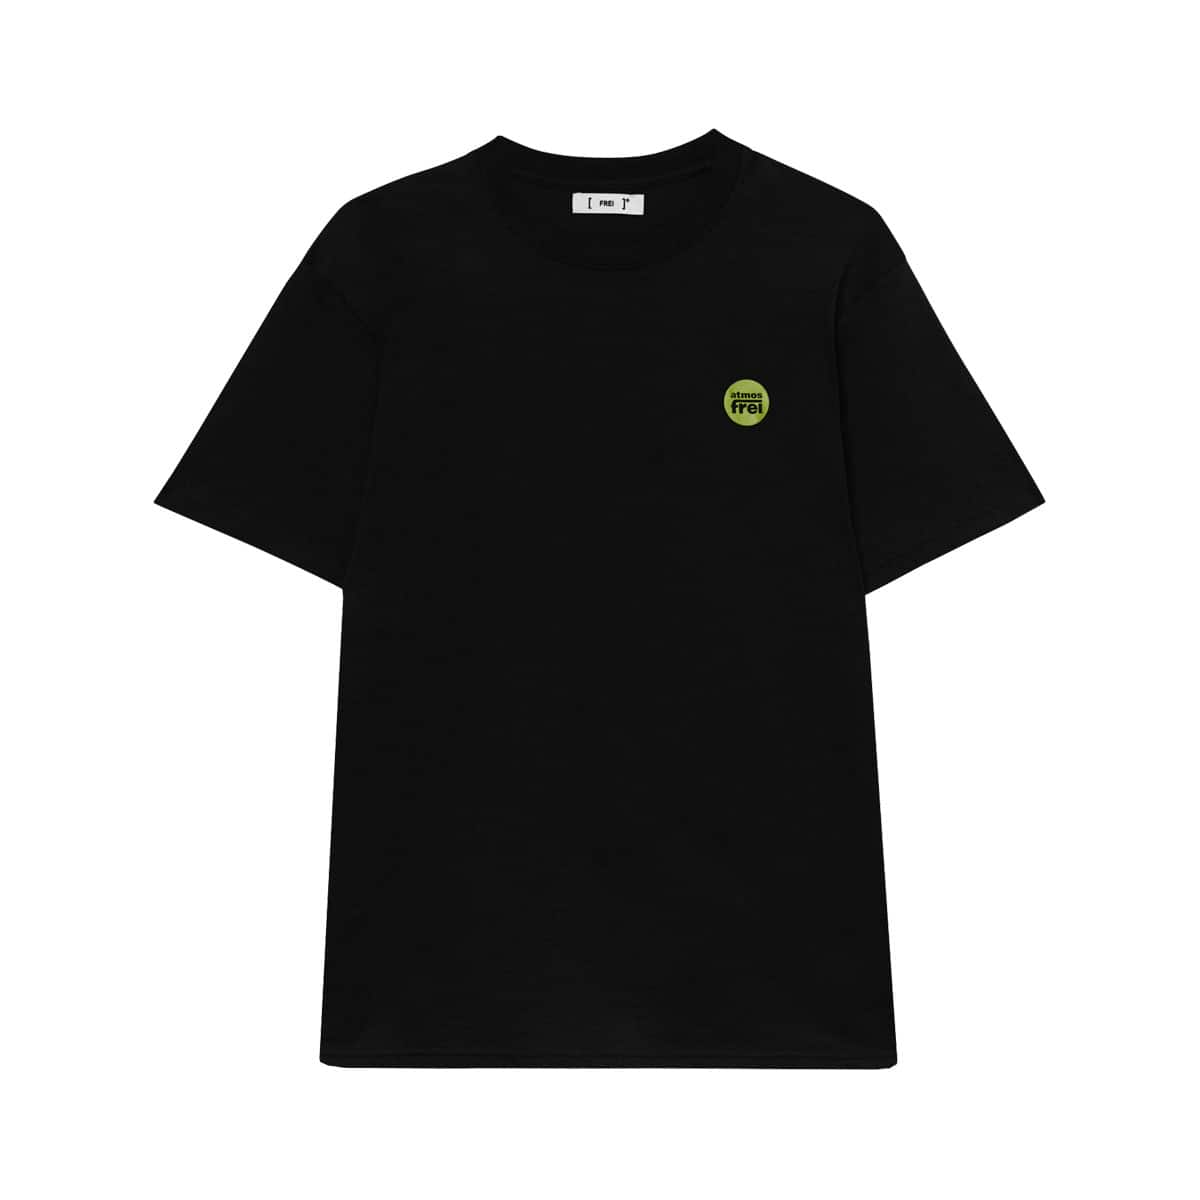 FREI X ATMOS POSTER T-SHIRT Black 20SU-I_photo_large